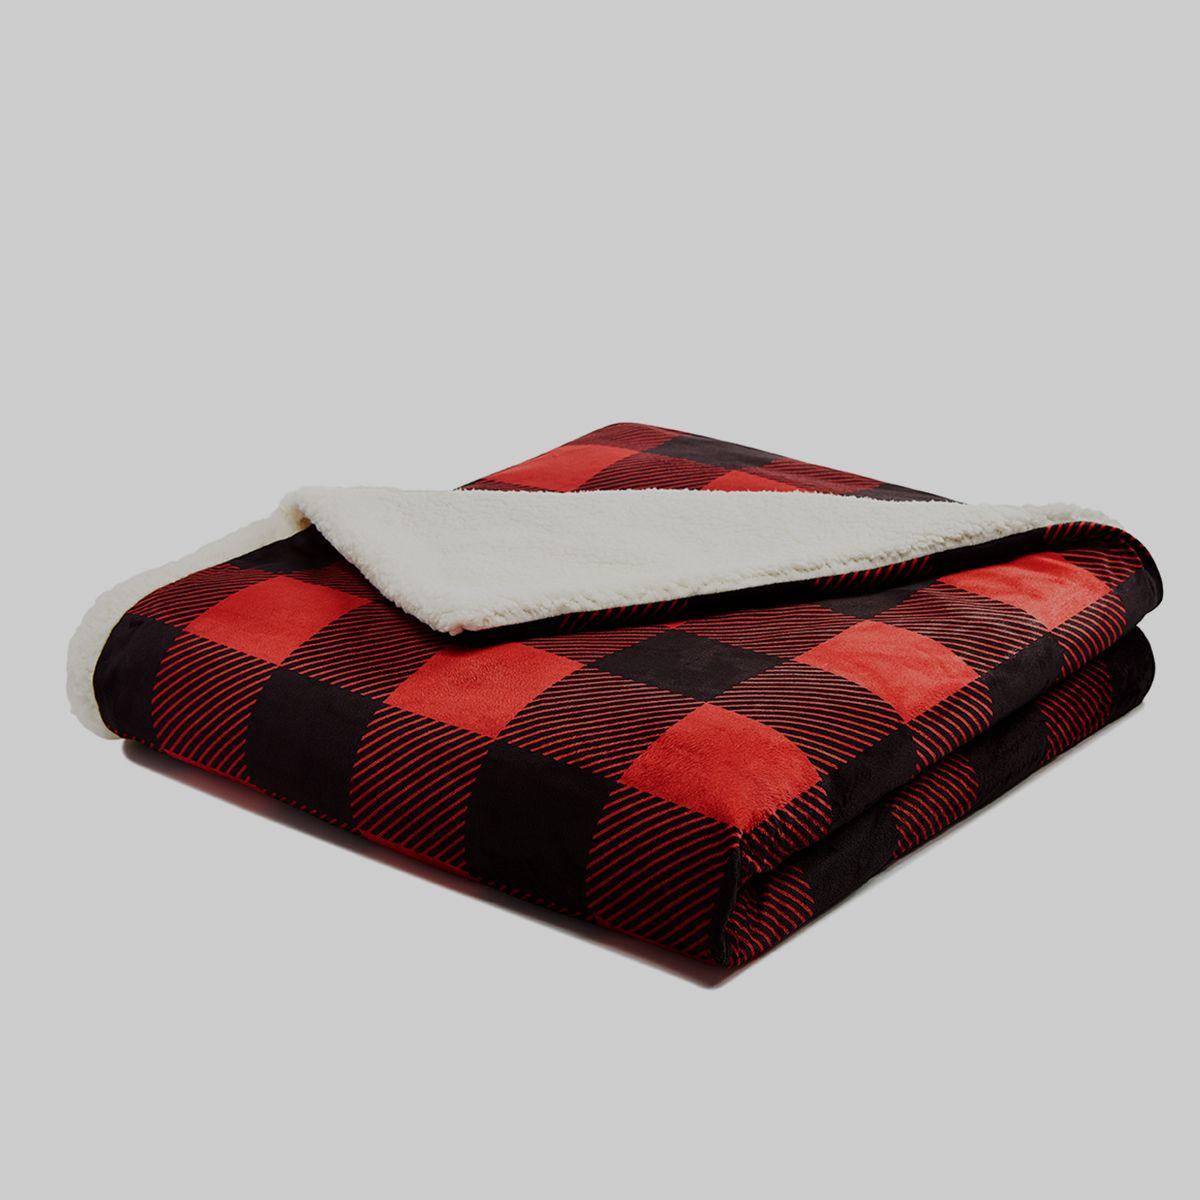 Christian Siriano Winter Bedding Macy S